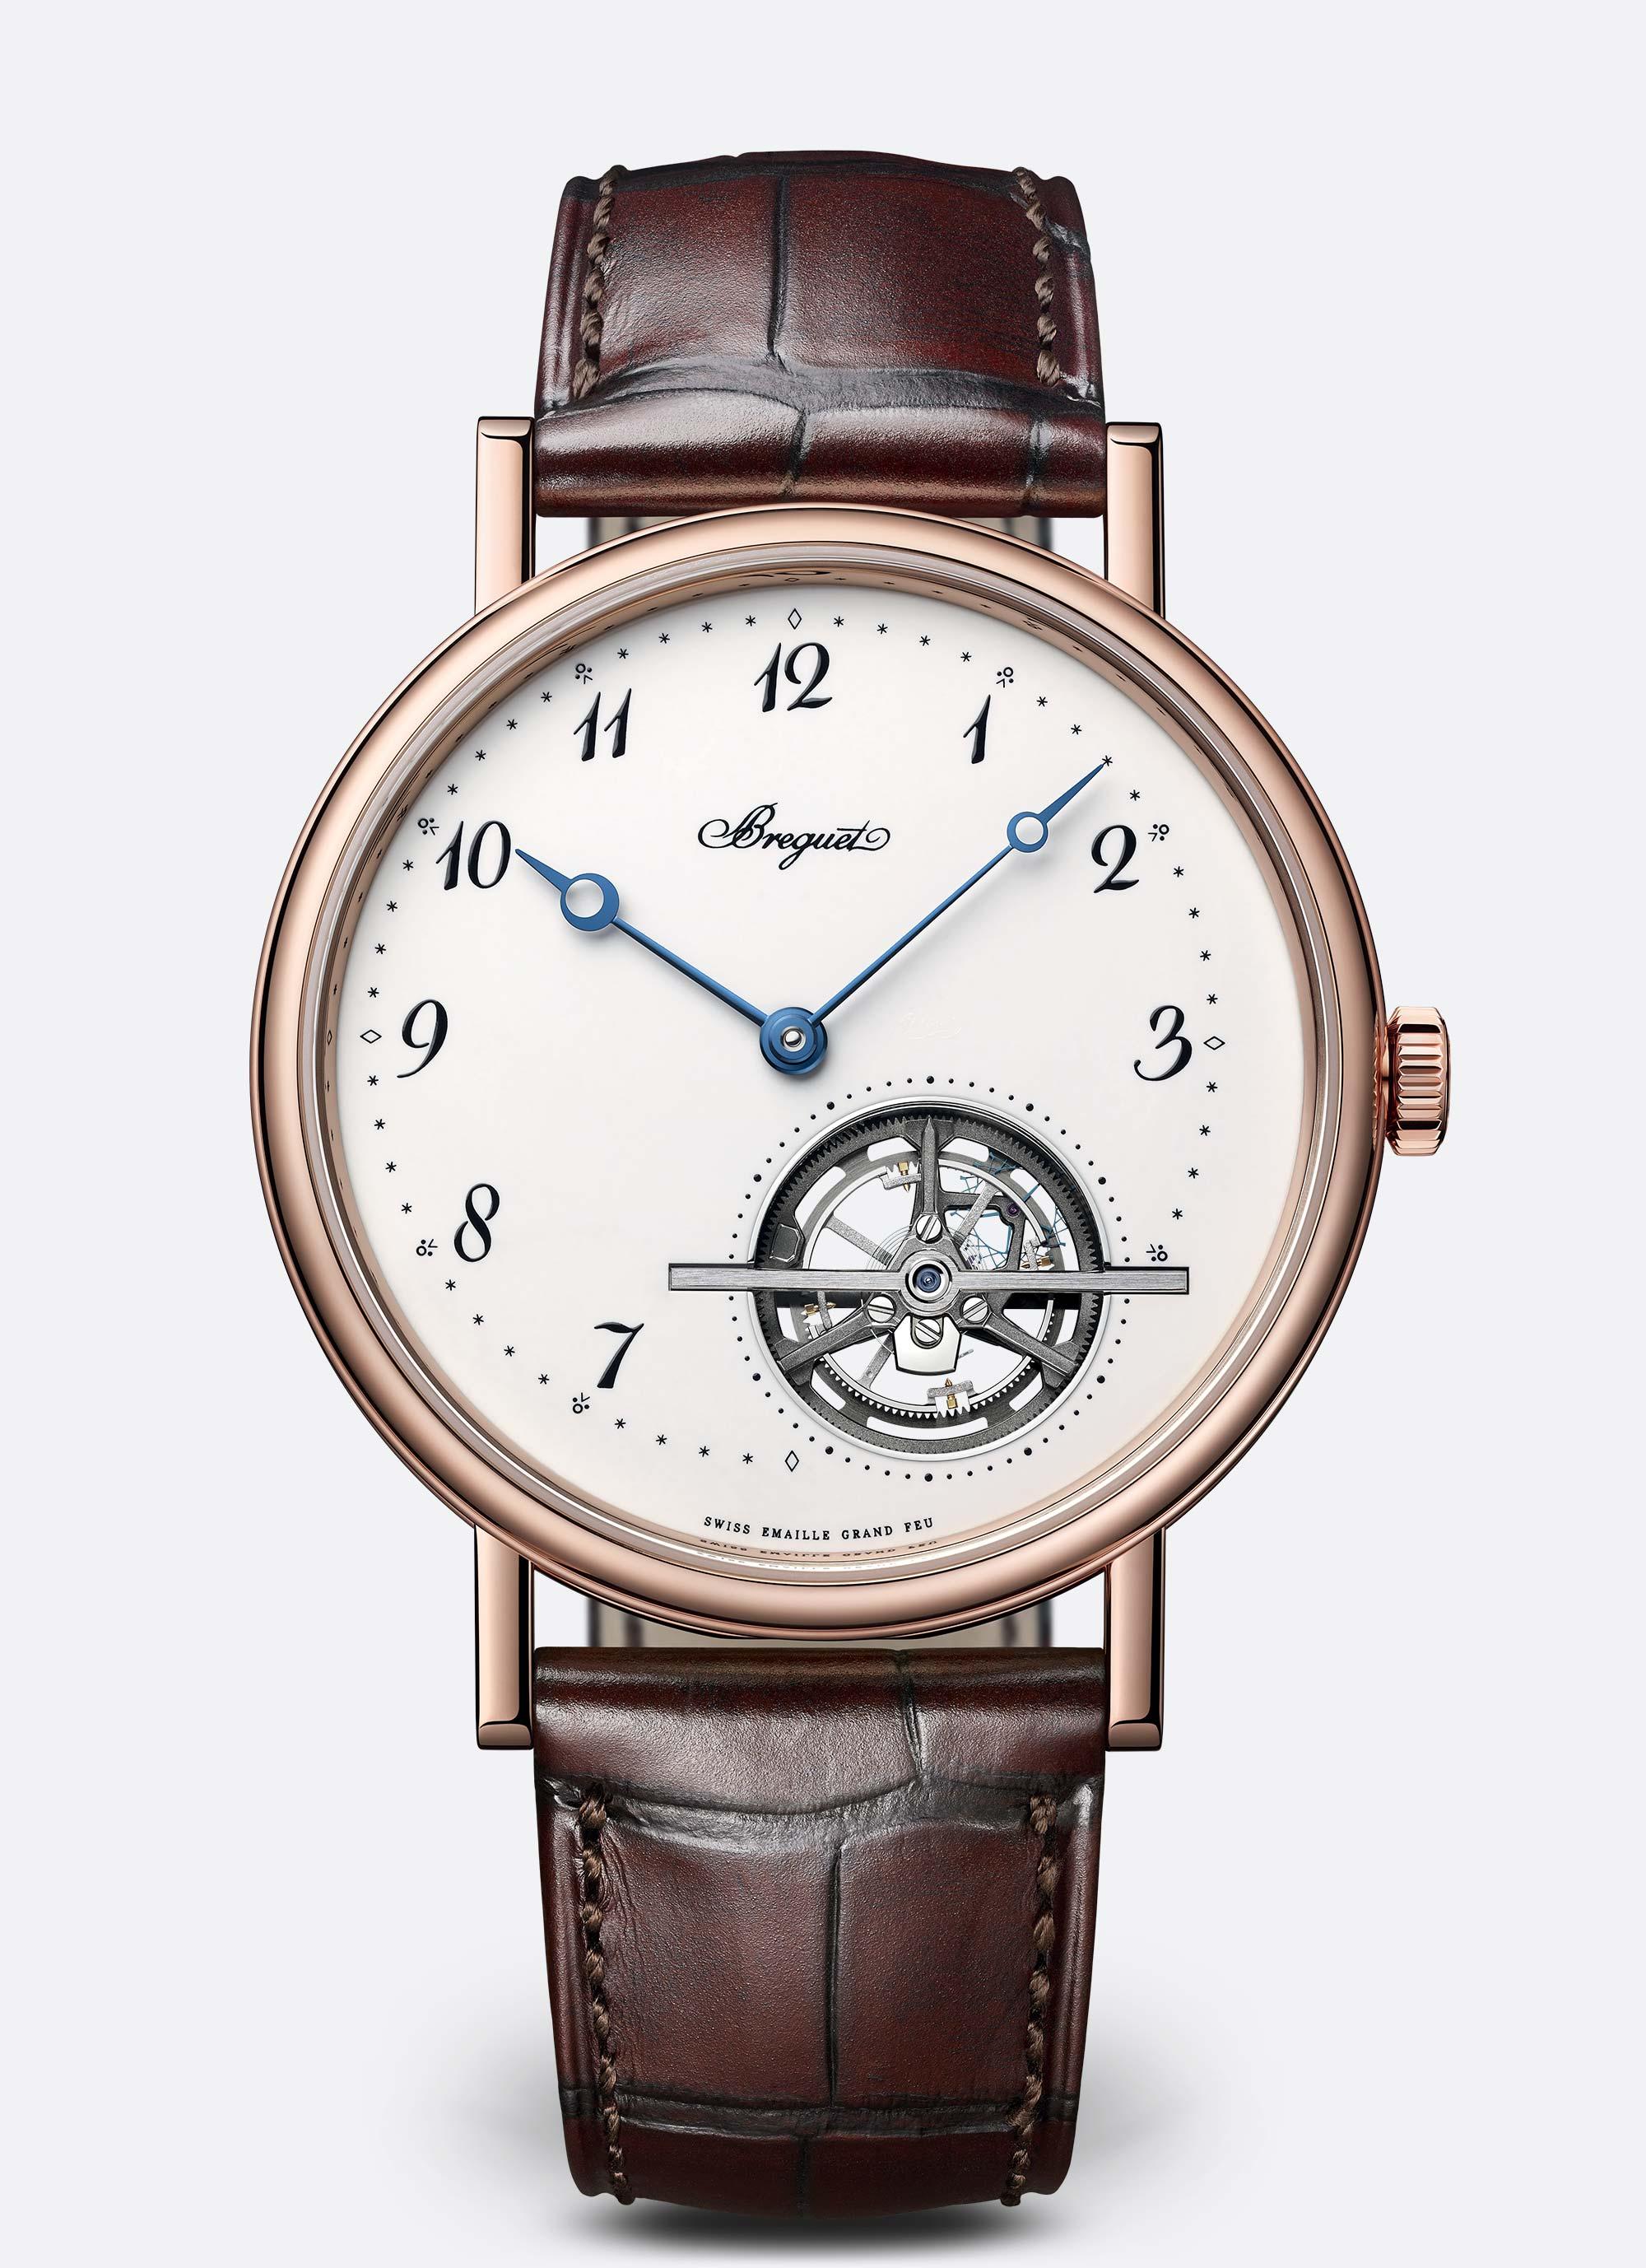 Breguet Classique Tourbillon Extra-Plat 5367, Tourbillon Watches